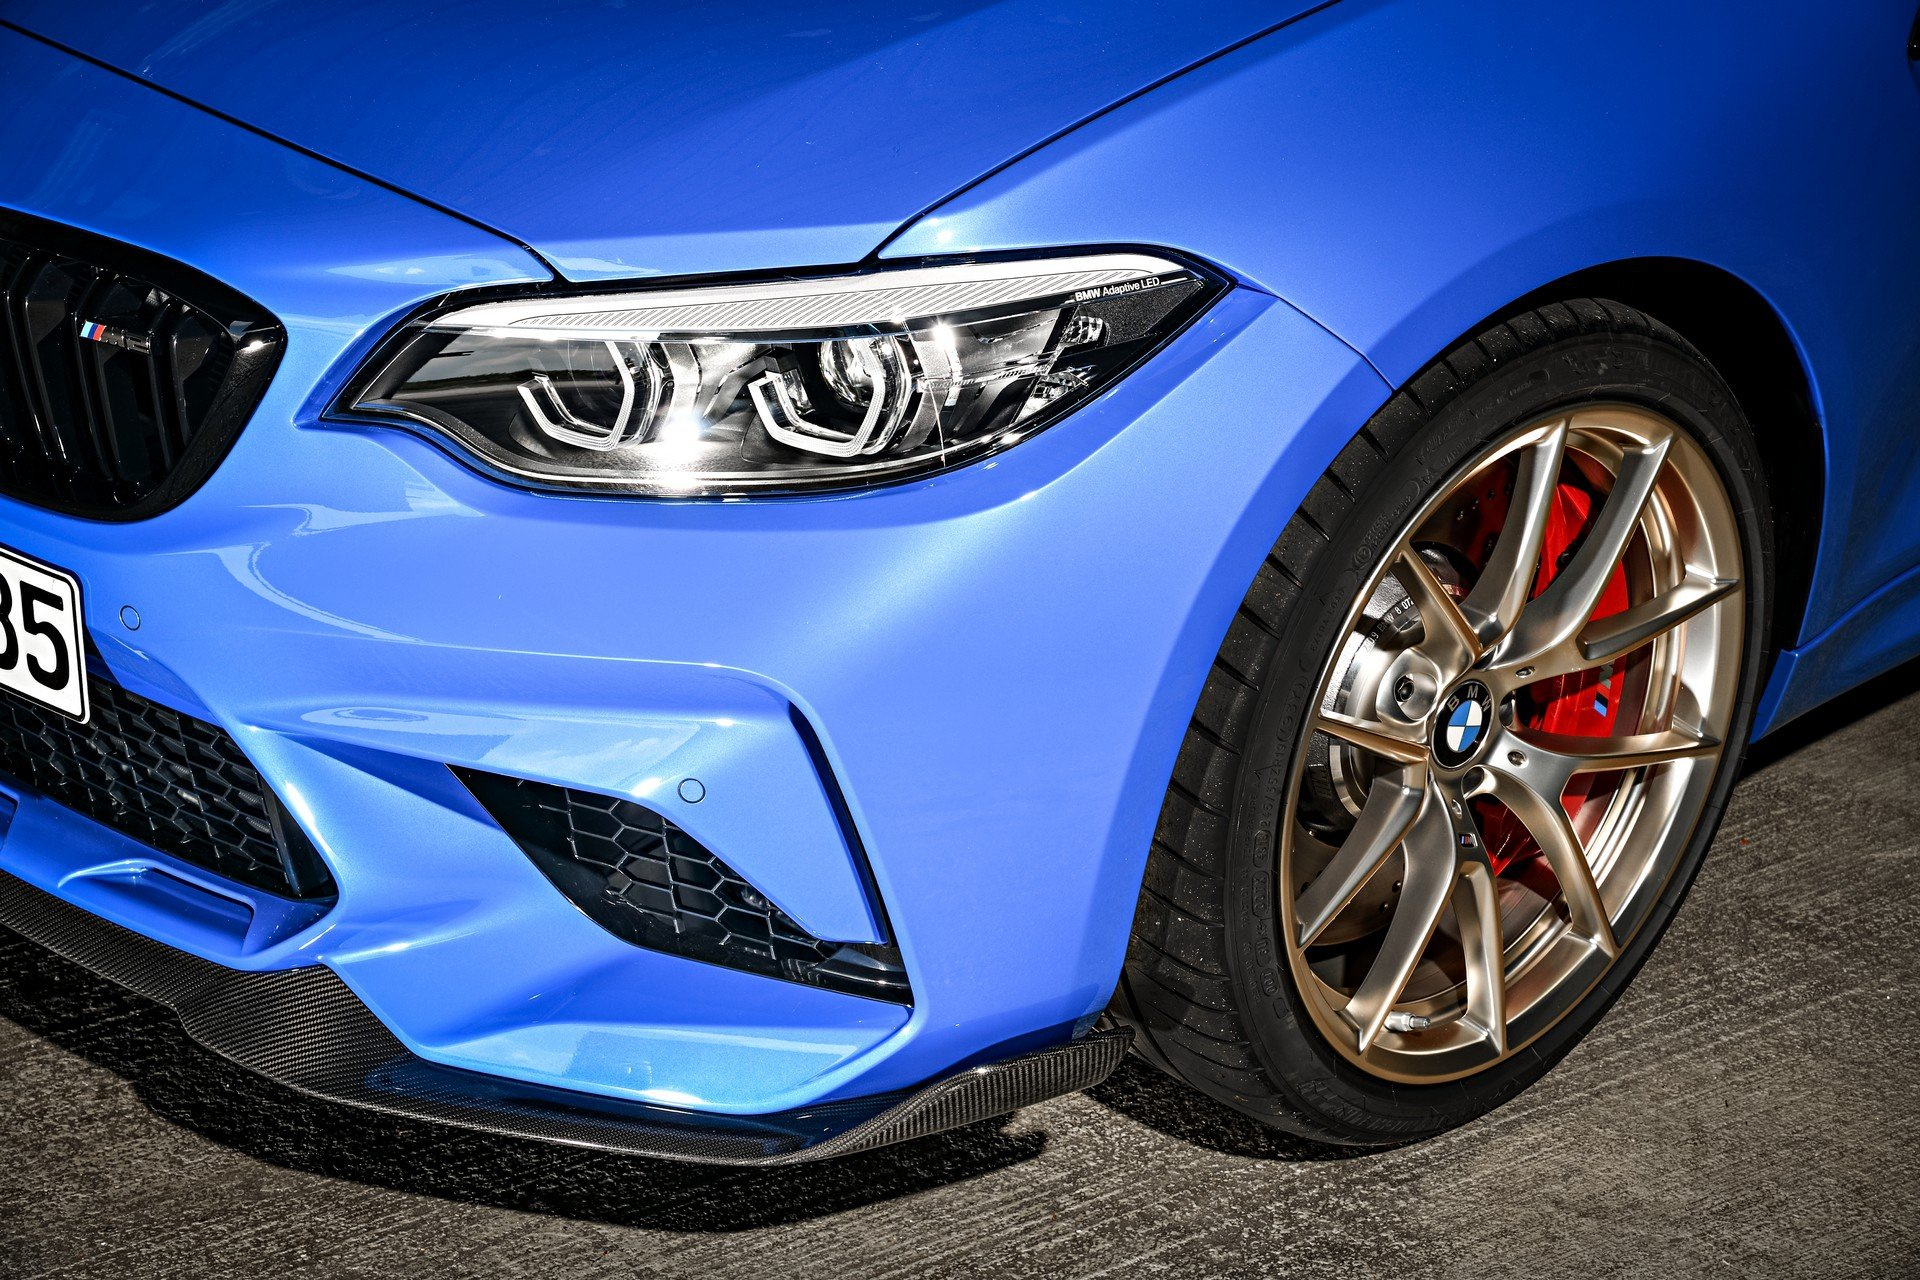 Chiem nguong BMW M2 C2 2020 anh 11